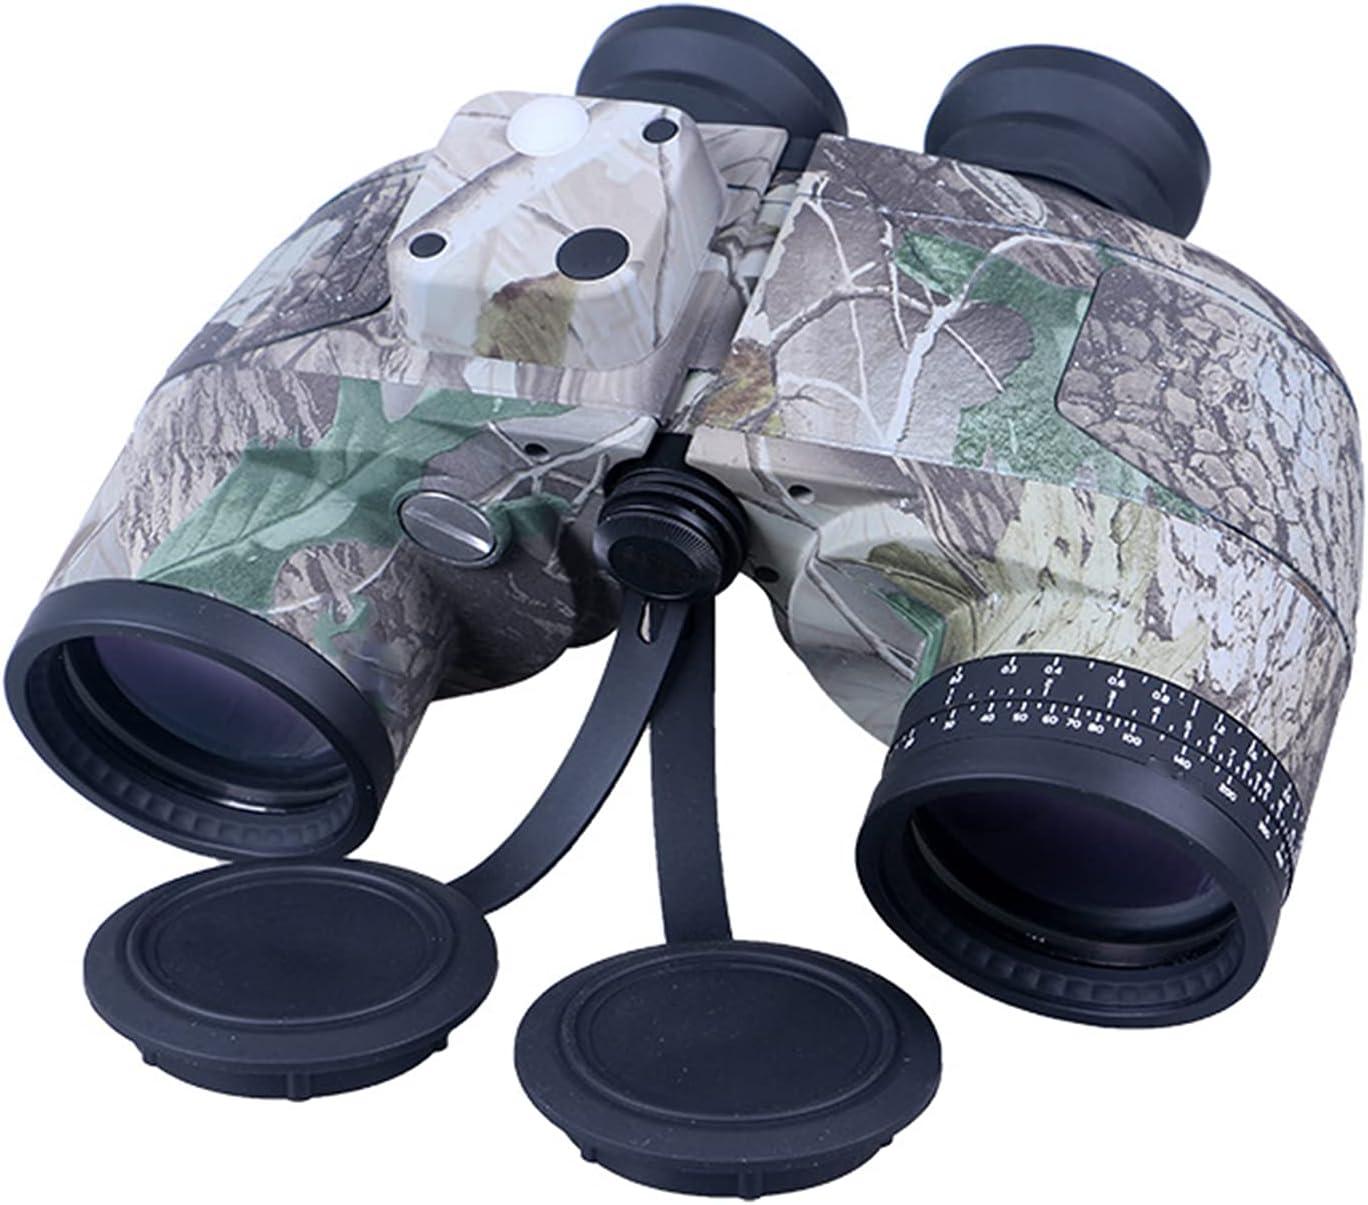 Kansas City Opening large release sale Mall DUTUI 10X50 Nautical Binoculars Low Light Night Vision R Azimuth